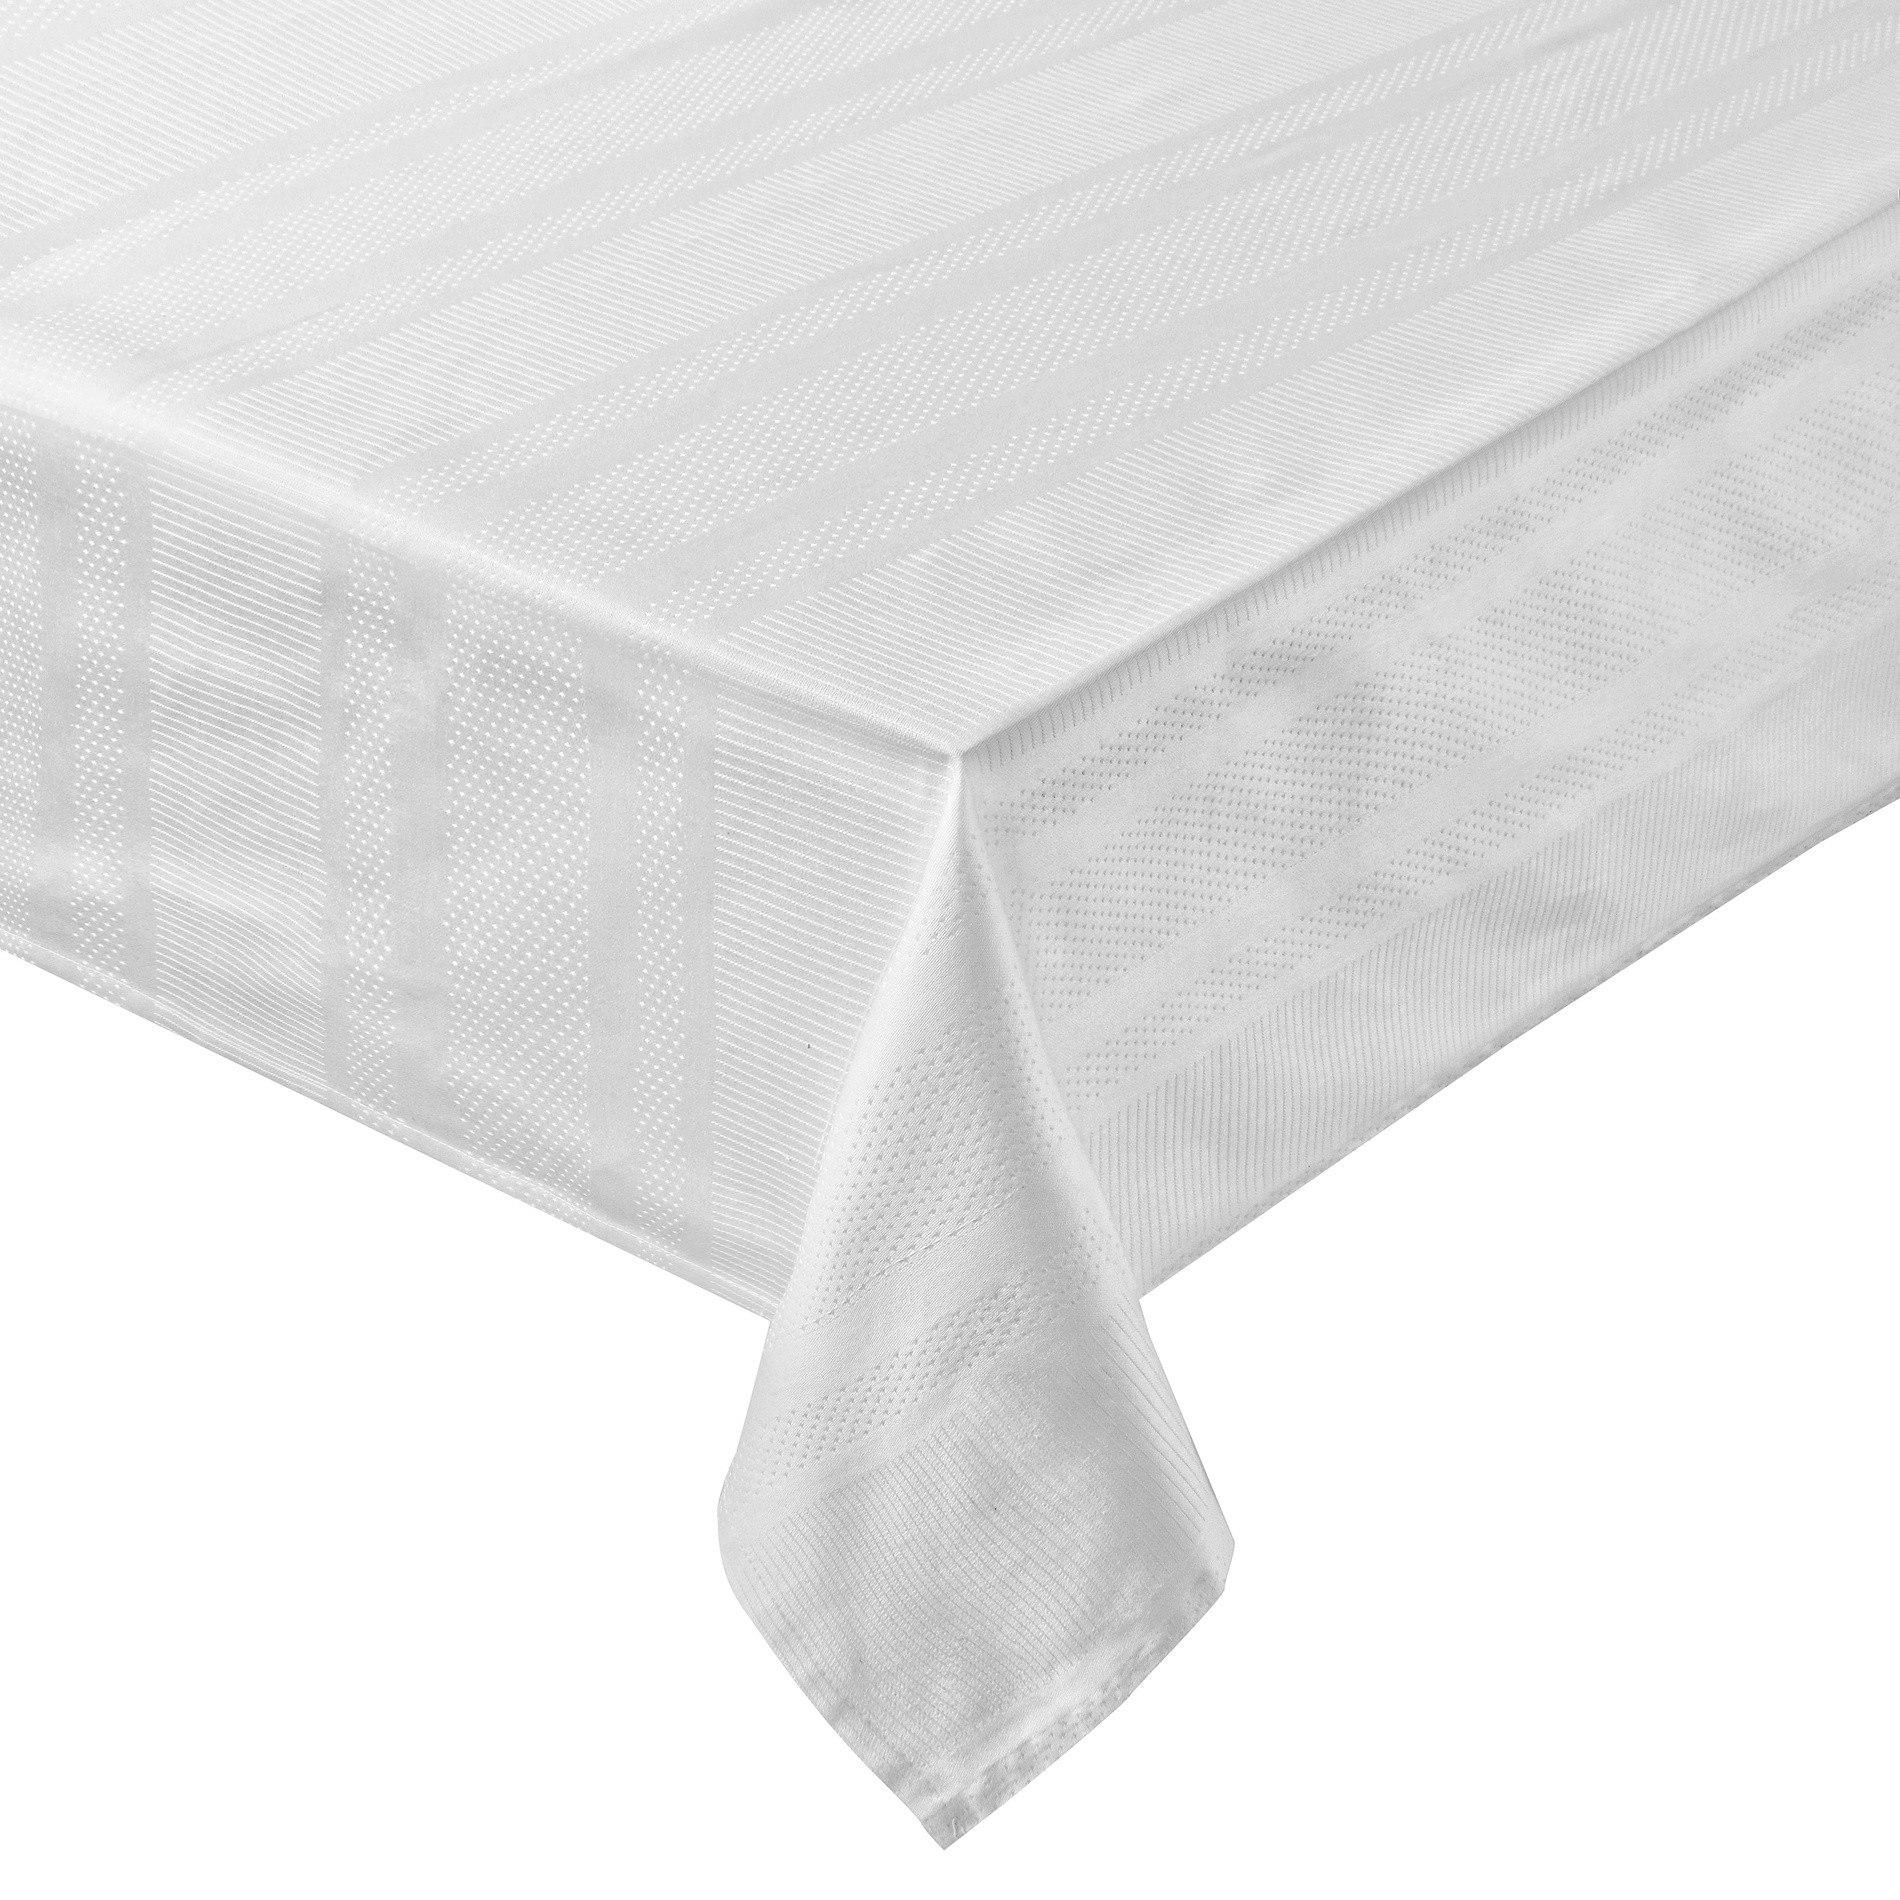 Tovaglia puro cotone egiziano jacquard, Bianco ghiaccio, large image number 0